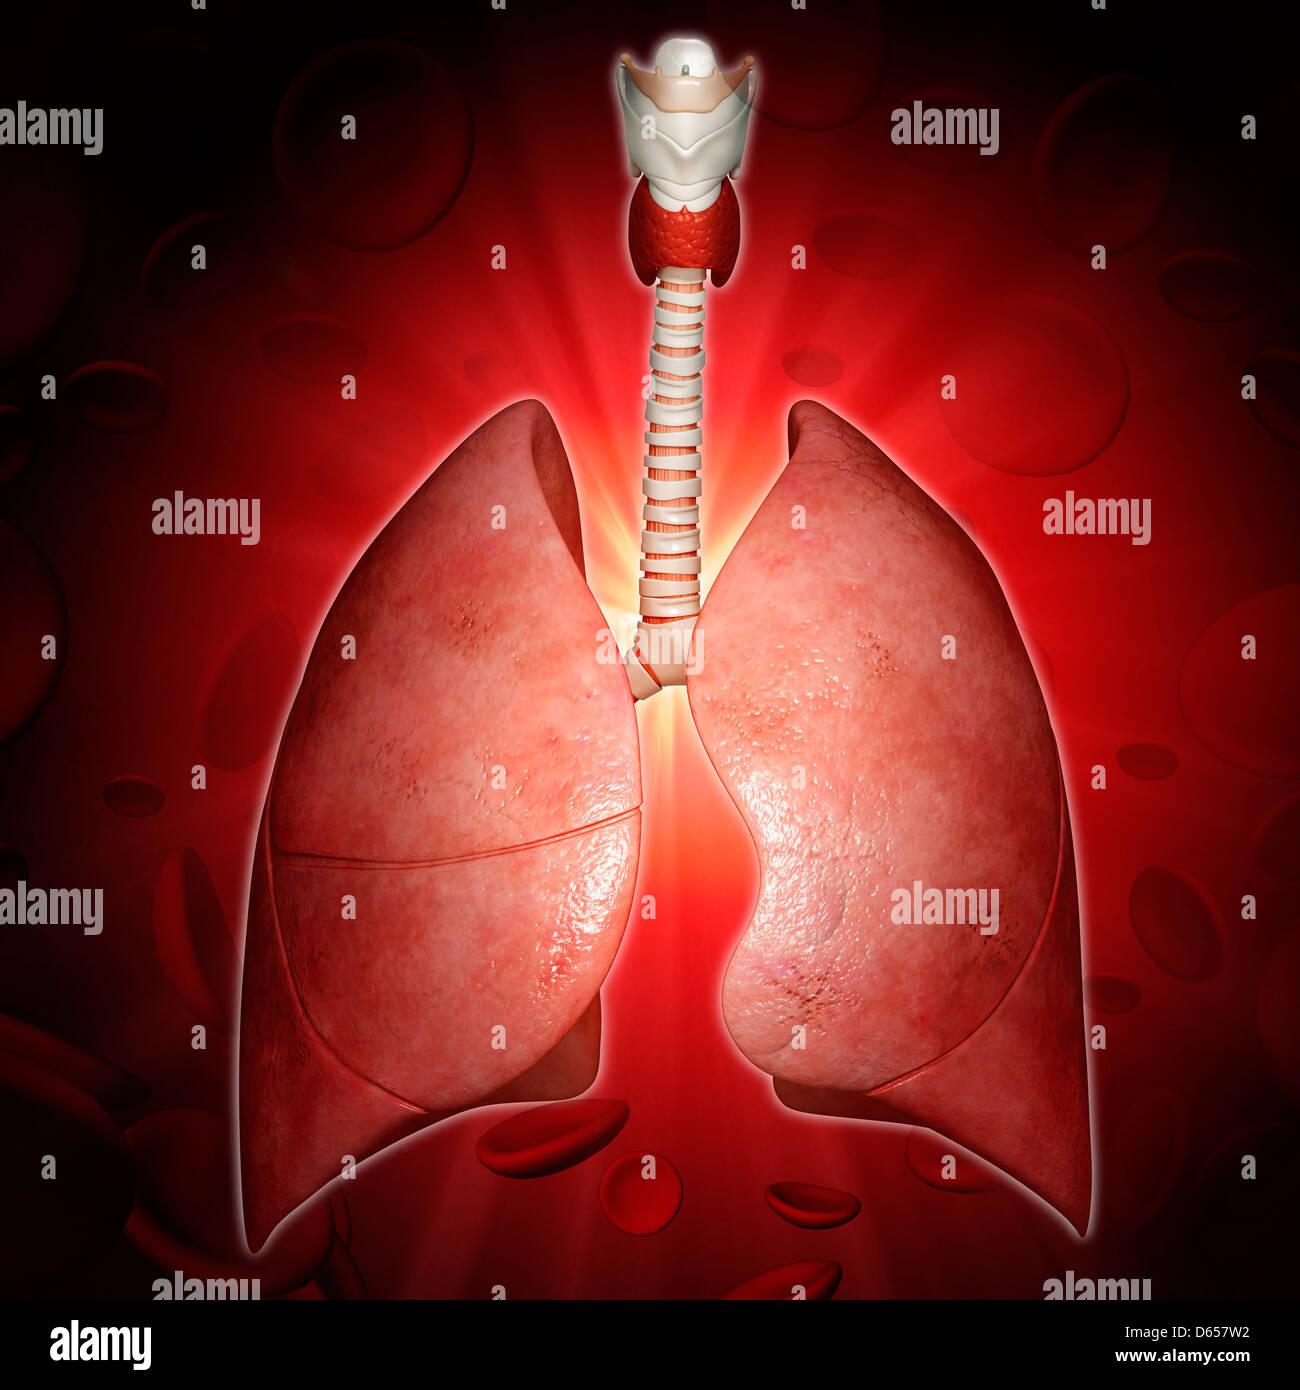 Respiratory system, artwork - Stock Image